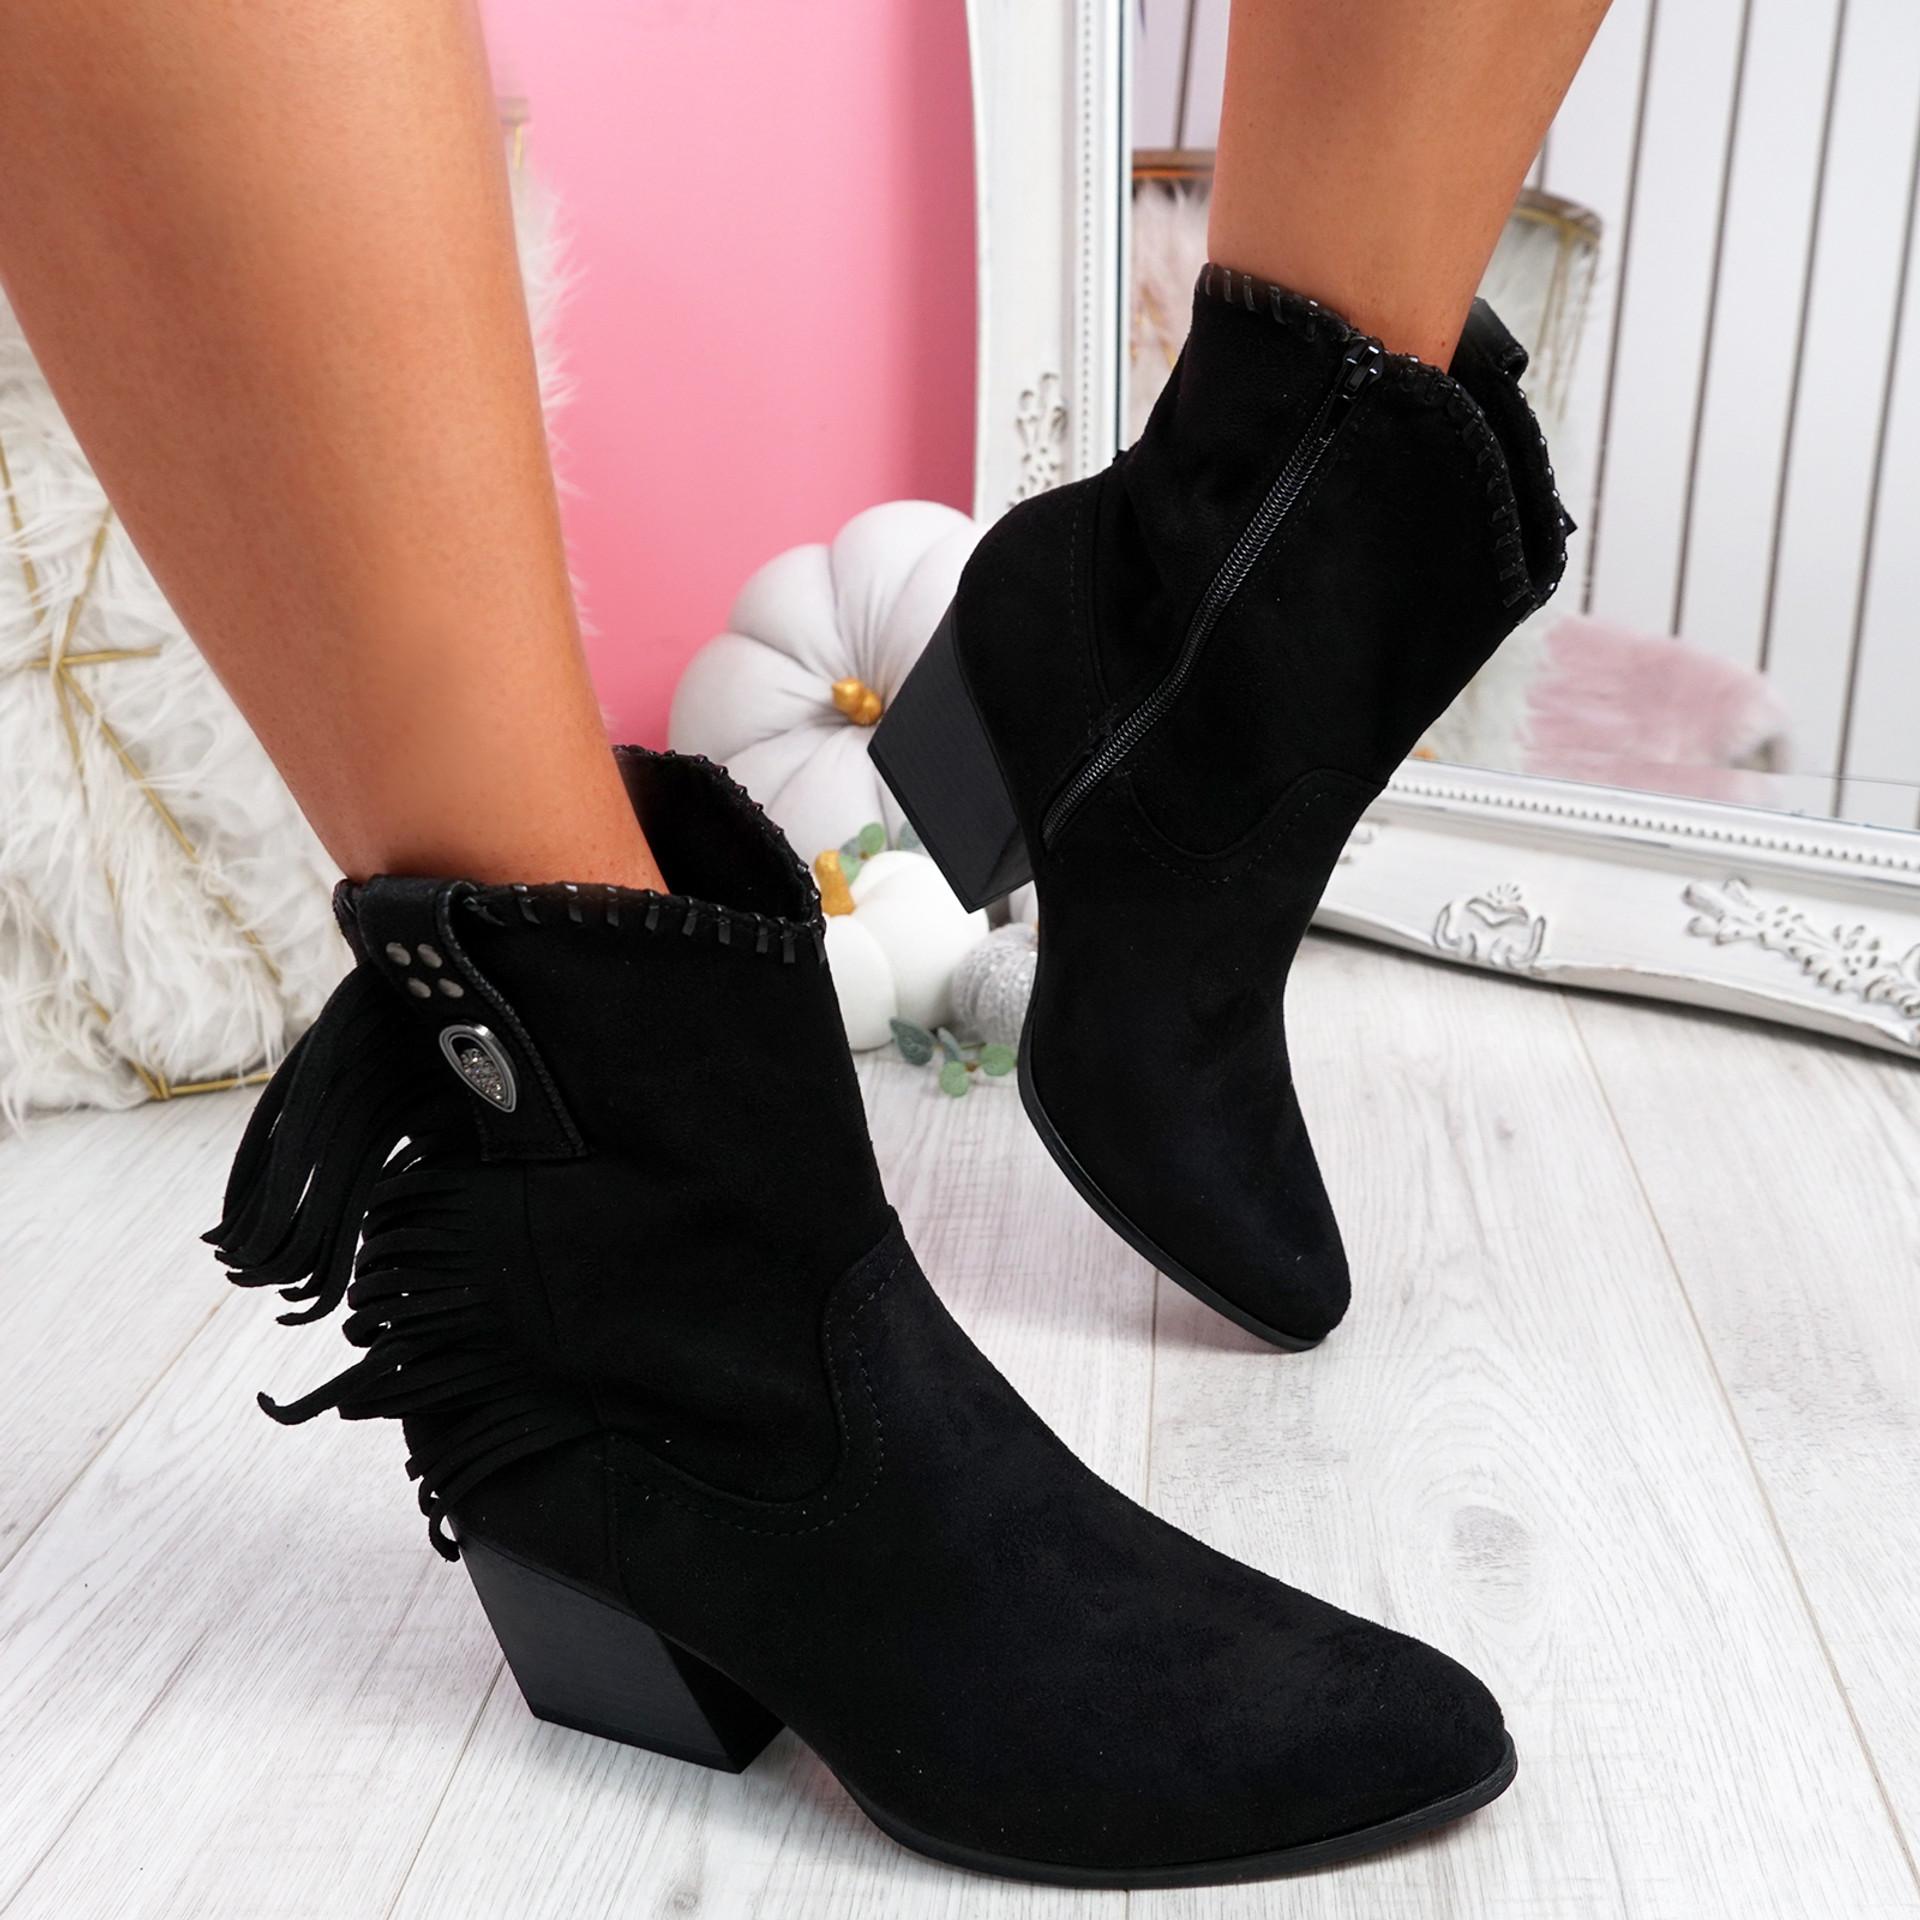 Numpy Black Fringe Ankle Boots